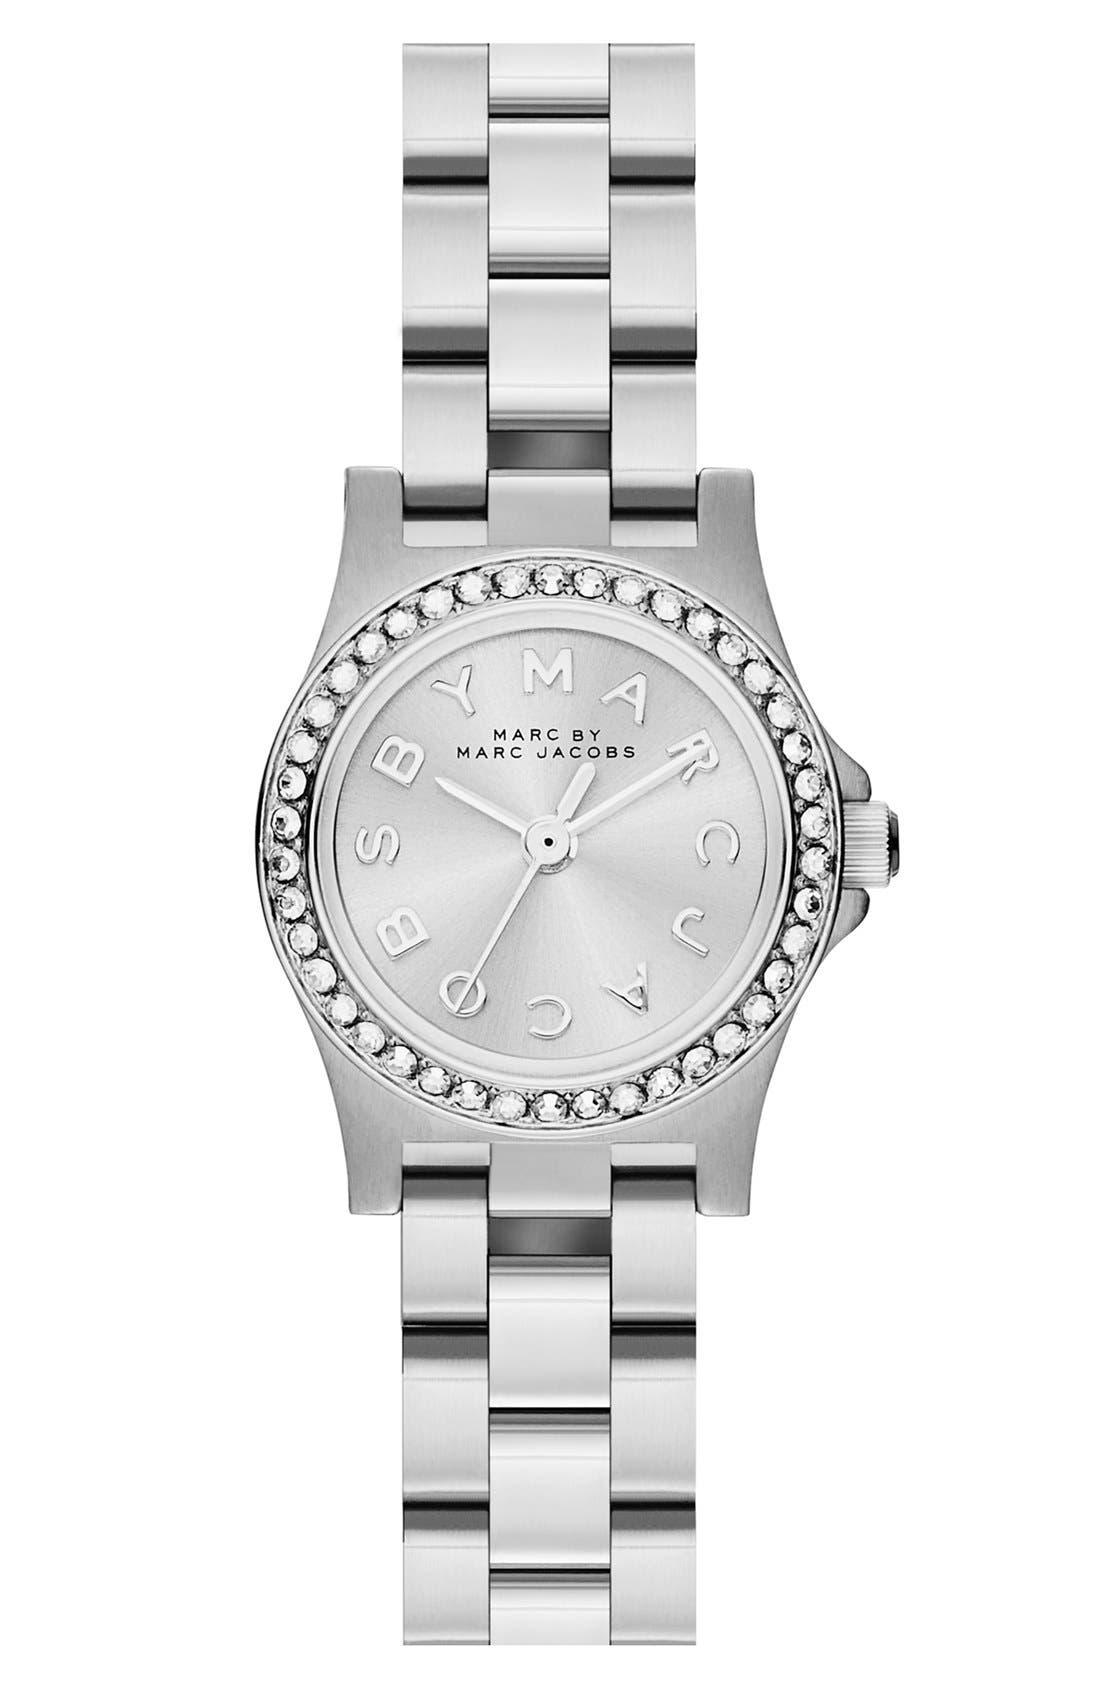 Main Image - MARC JACOBS 'Henry Dinky' Crystal Bracelet Watch, 21mm